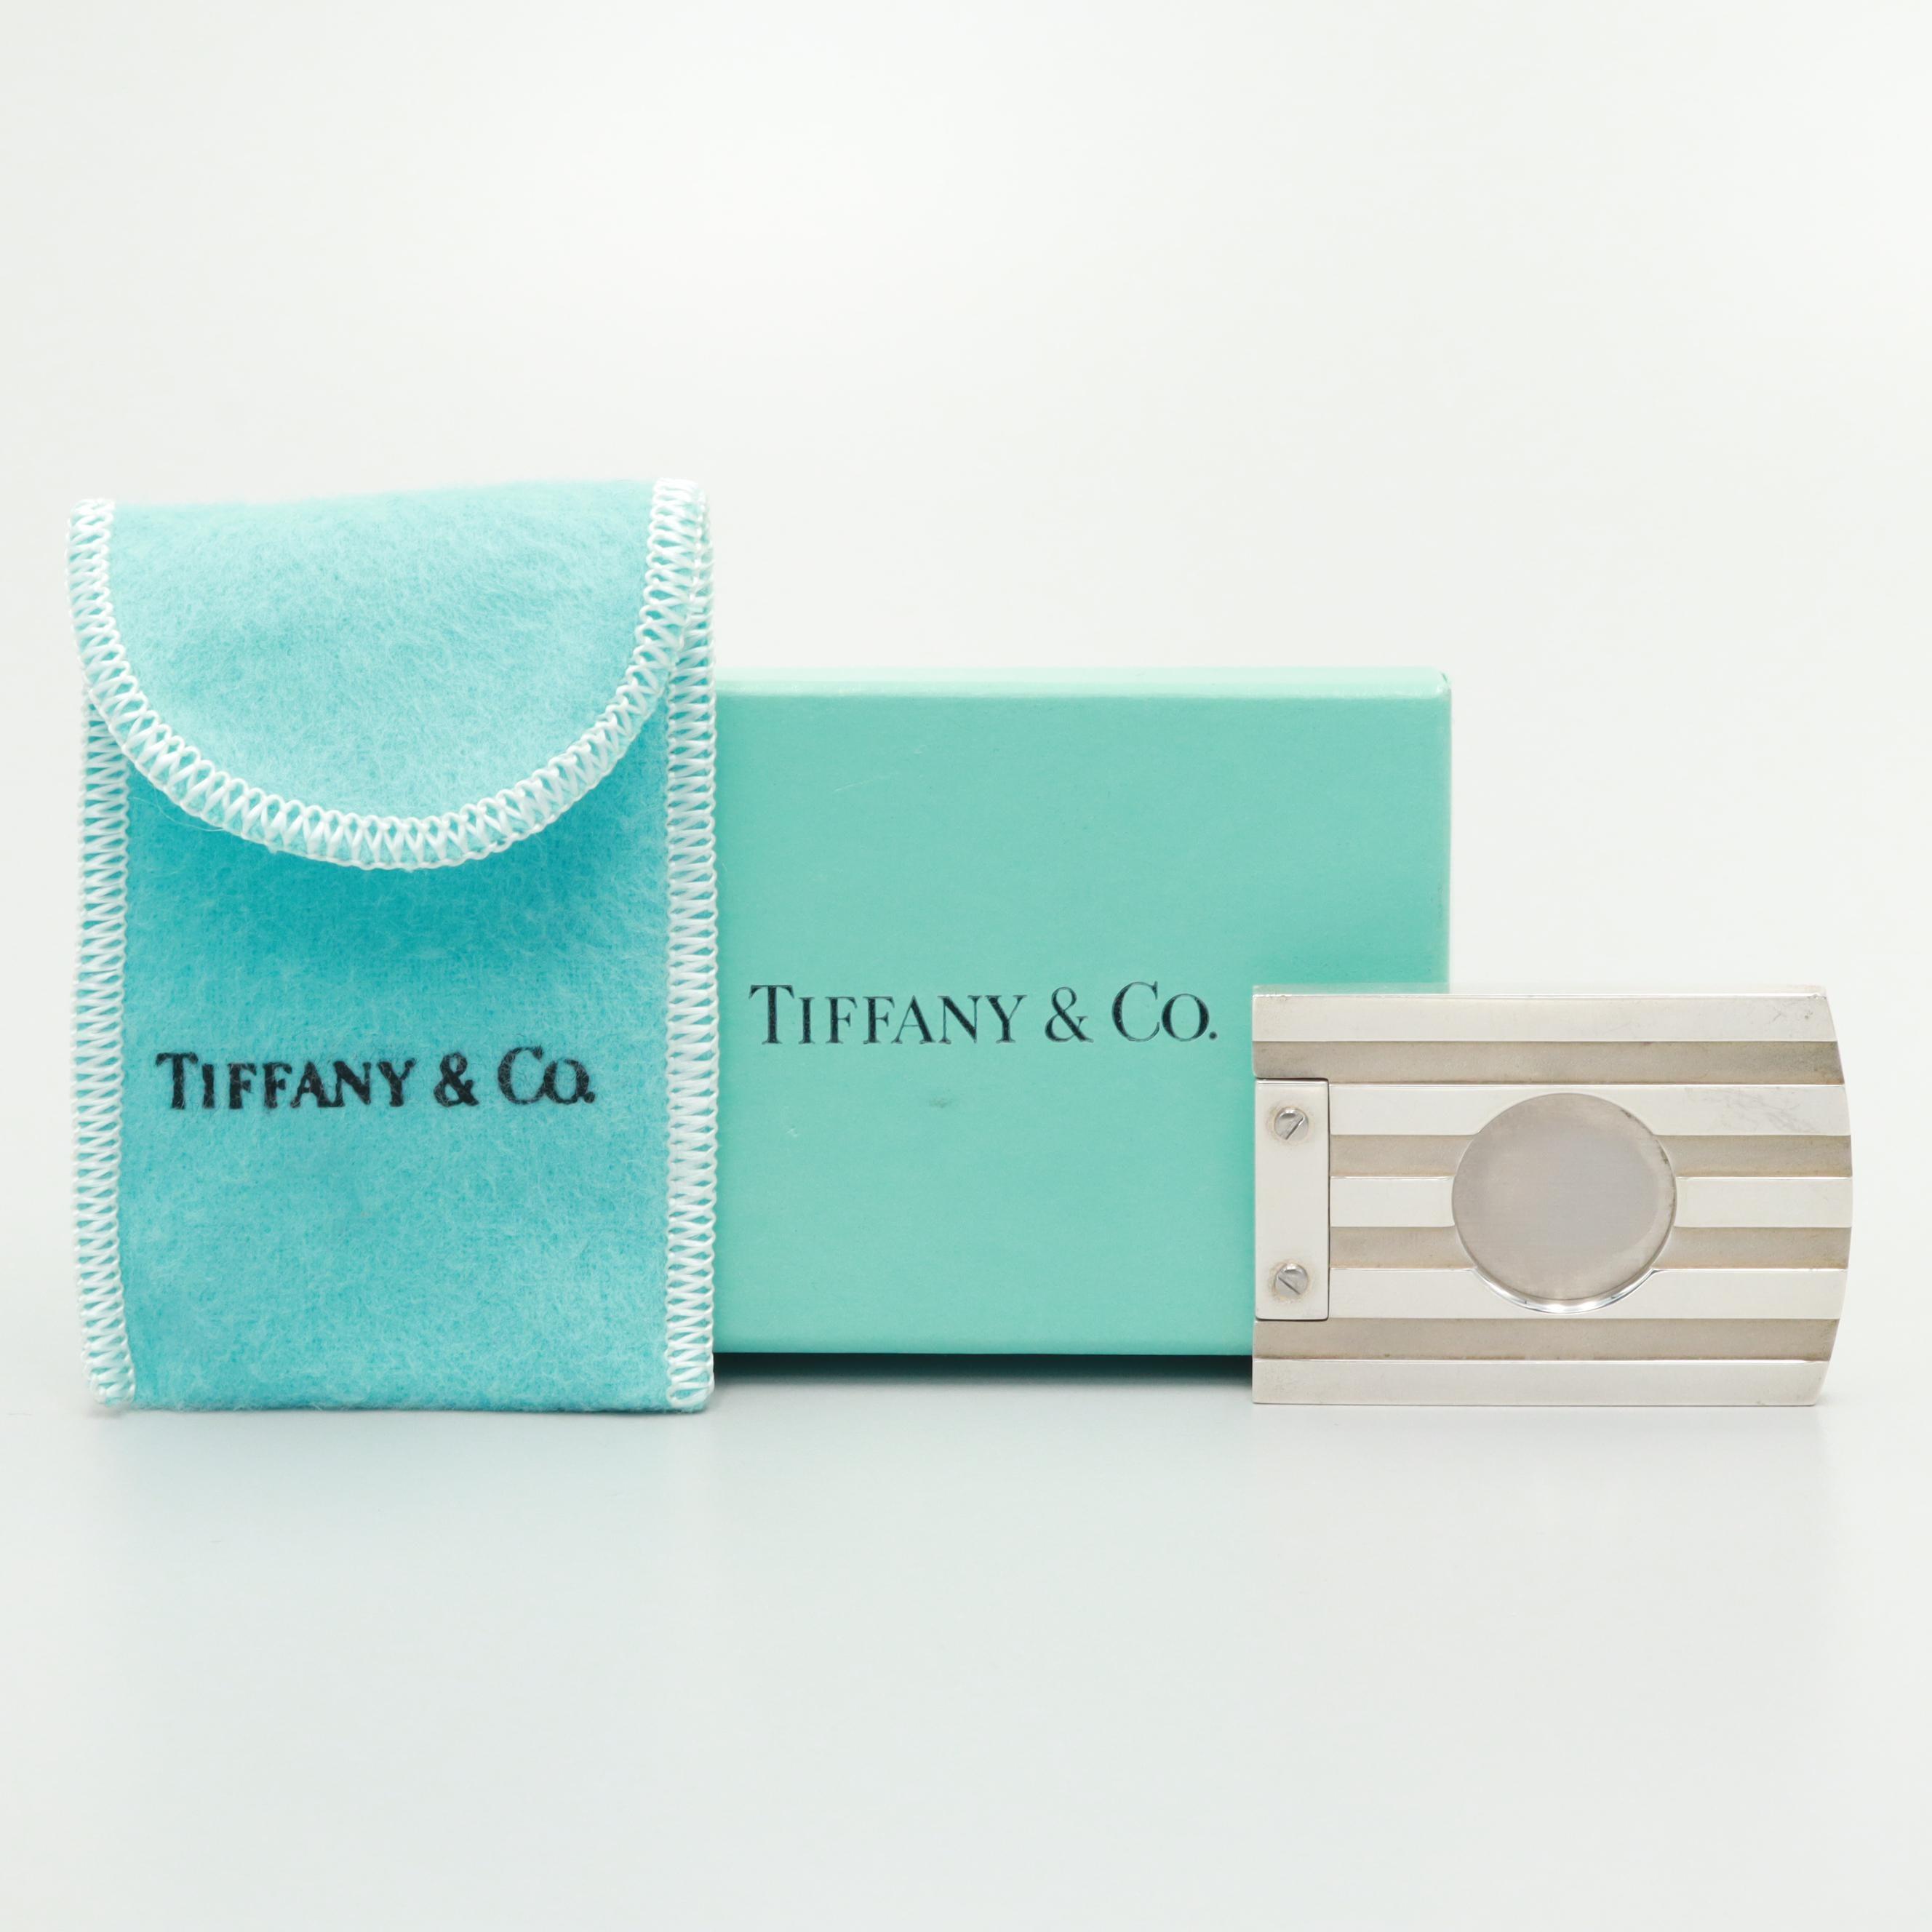 Tiffany & Co. Sterling Silver Cigar Cutter